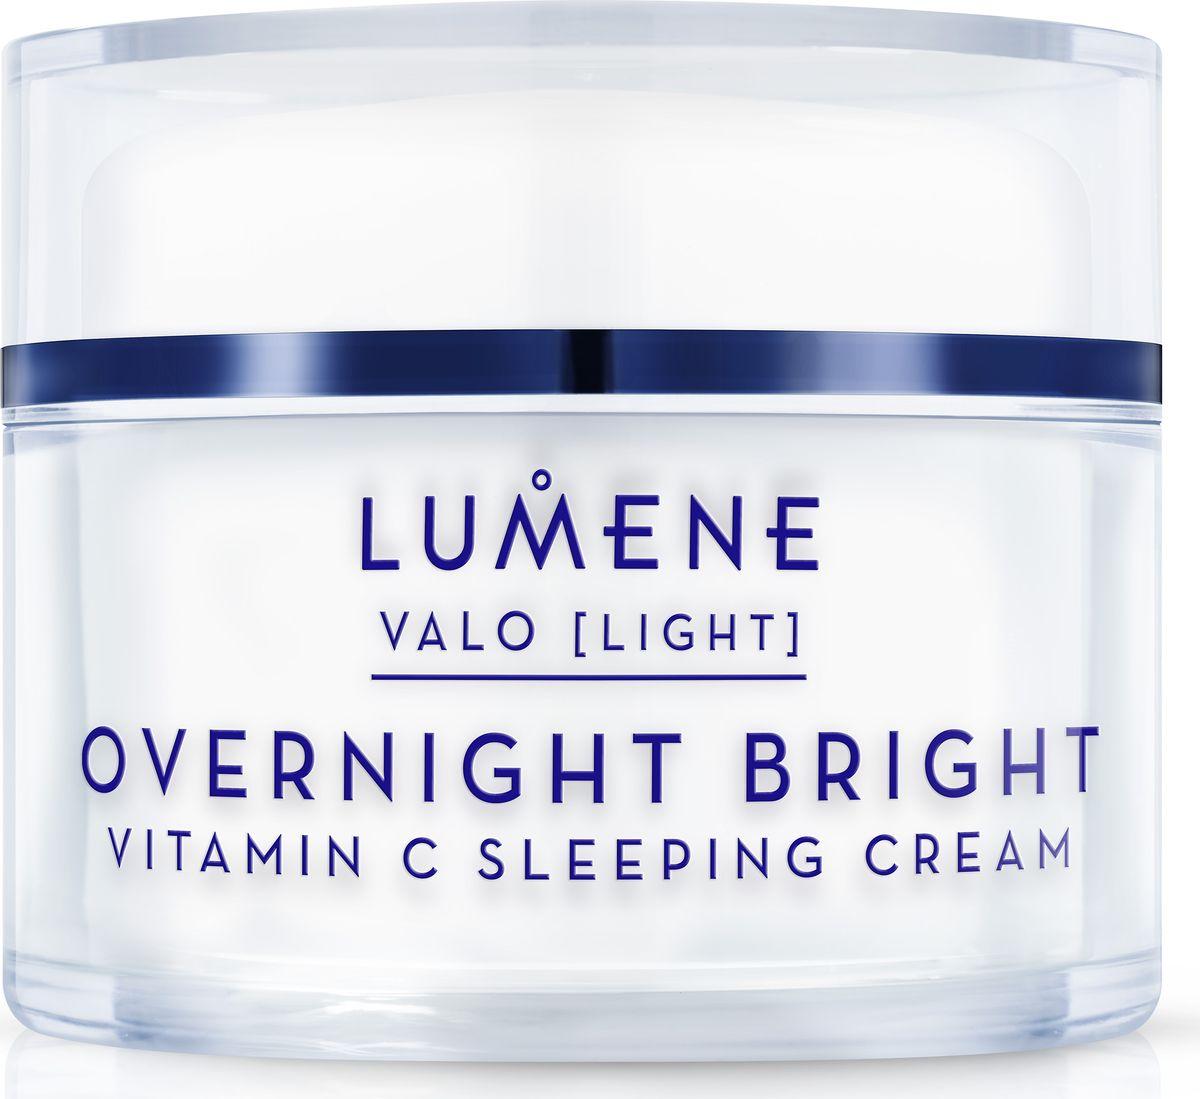 Lumene Valo Восстанавливающий крем-сон Vitamin C, 50 мл lumene valo придающий сияние дневной крем vitamin c 50 мл